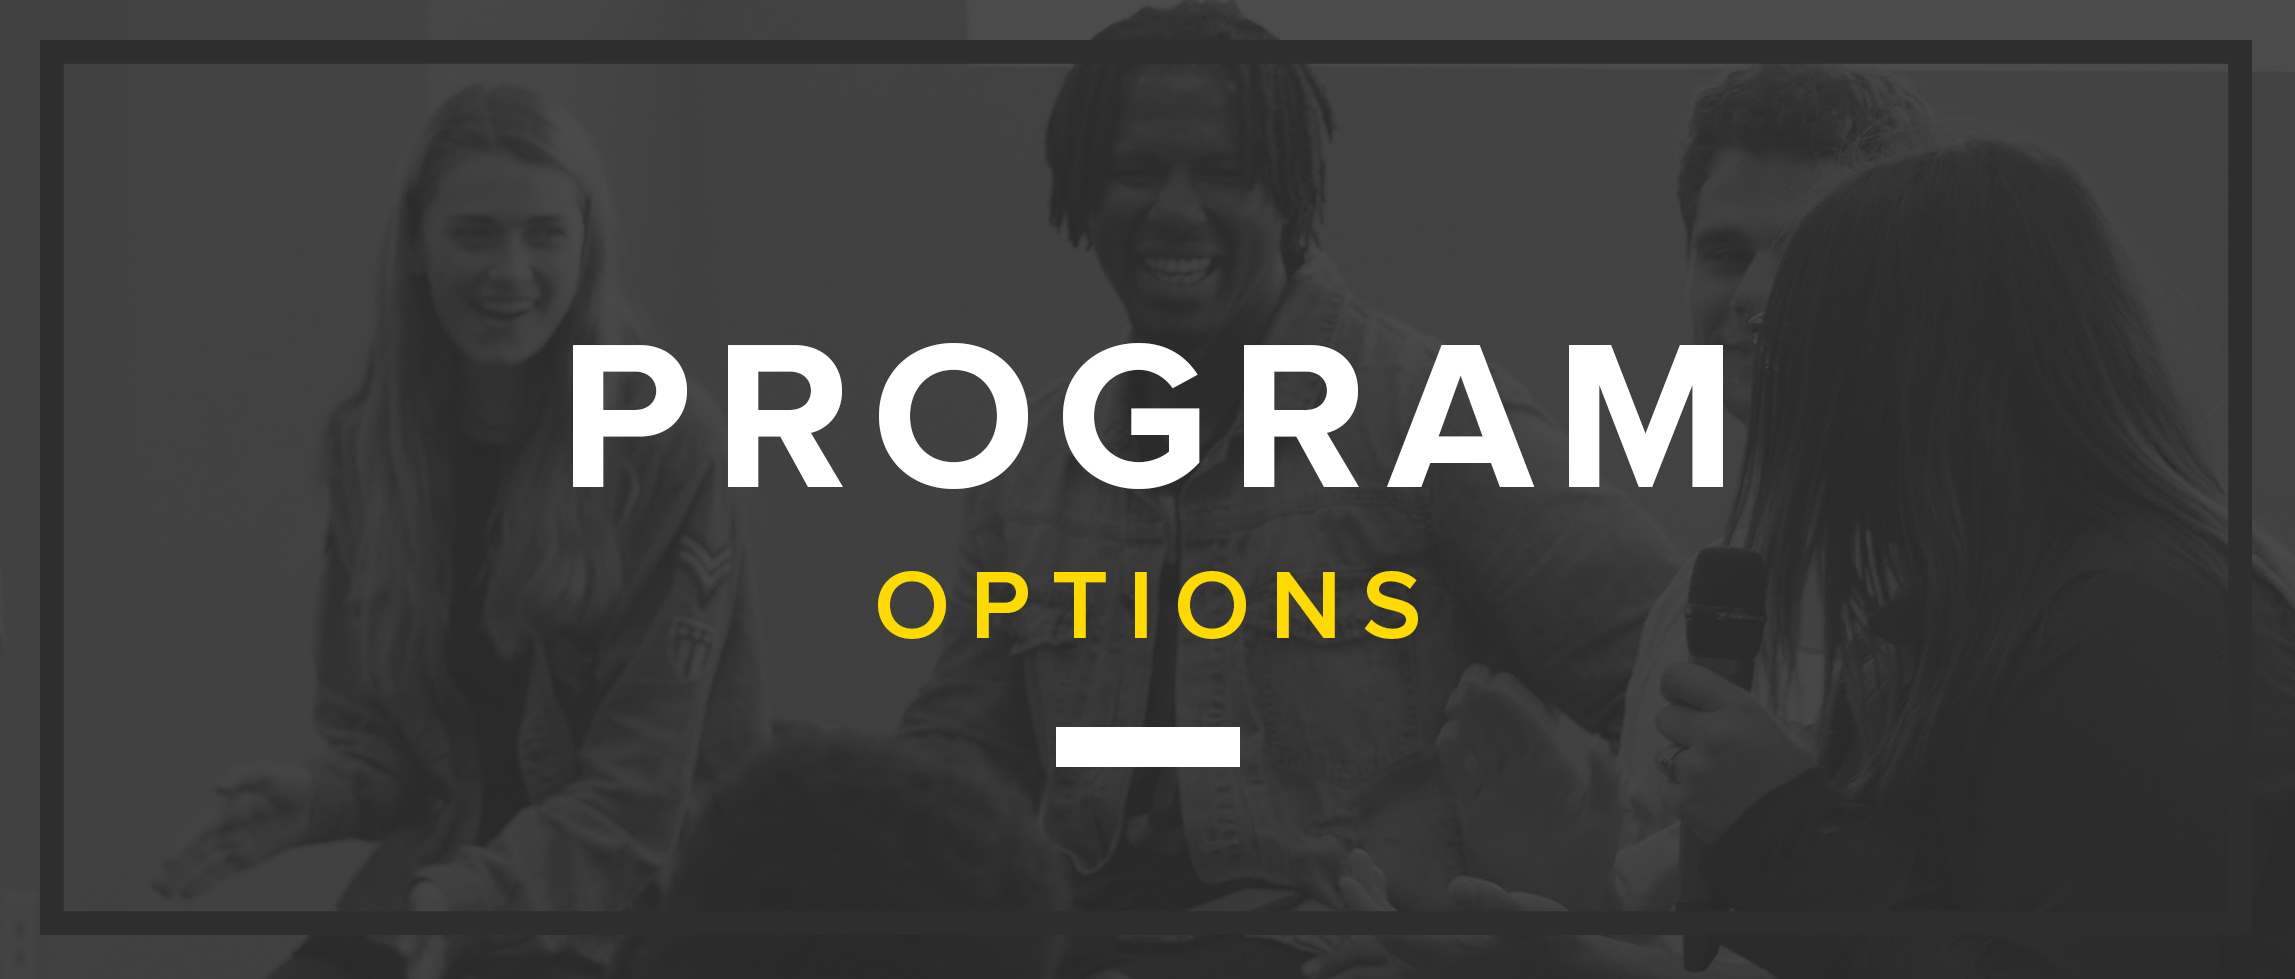 ProgramOptions.jpg